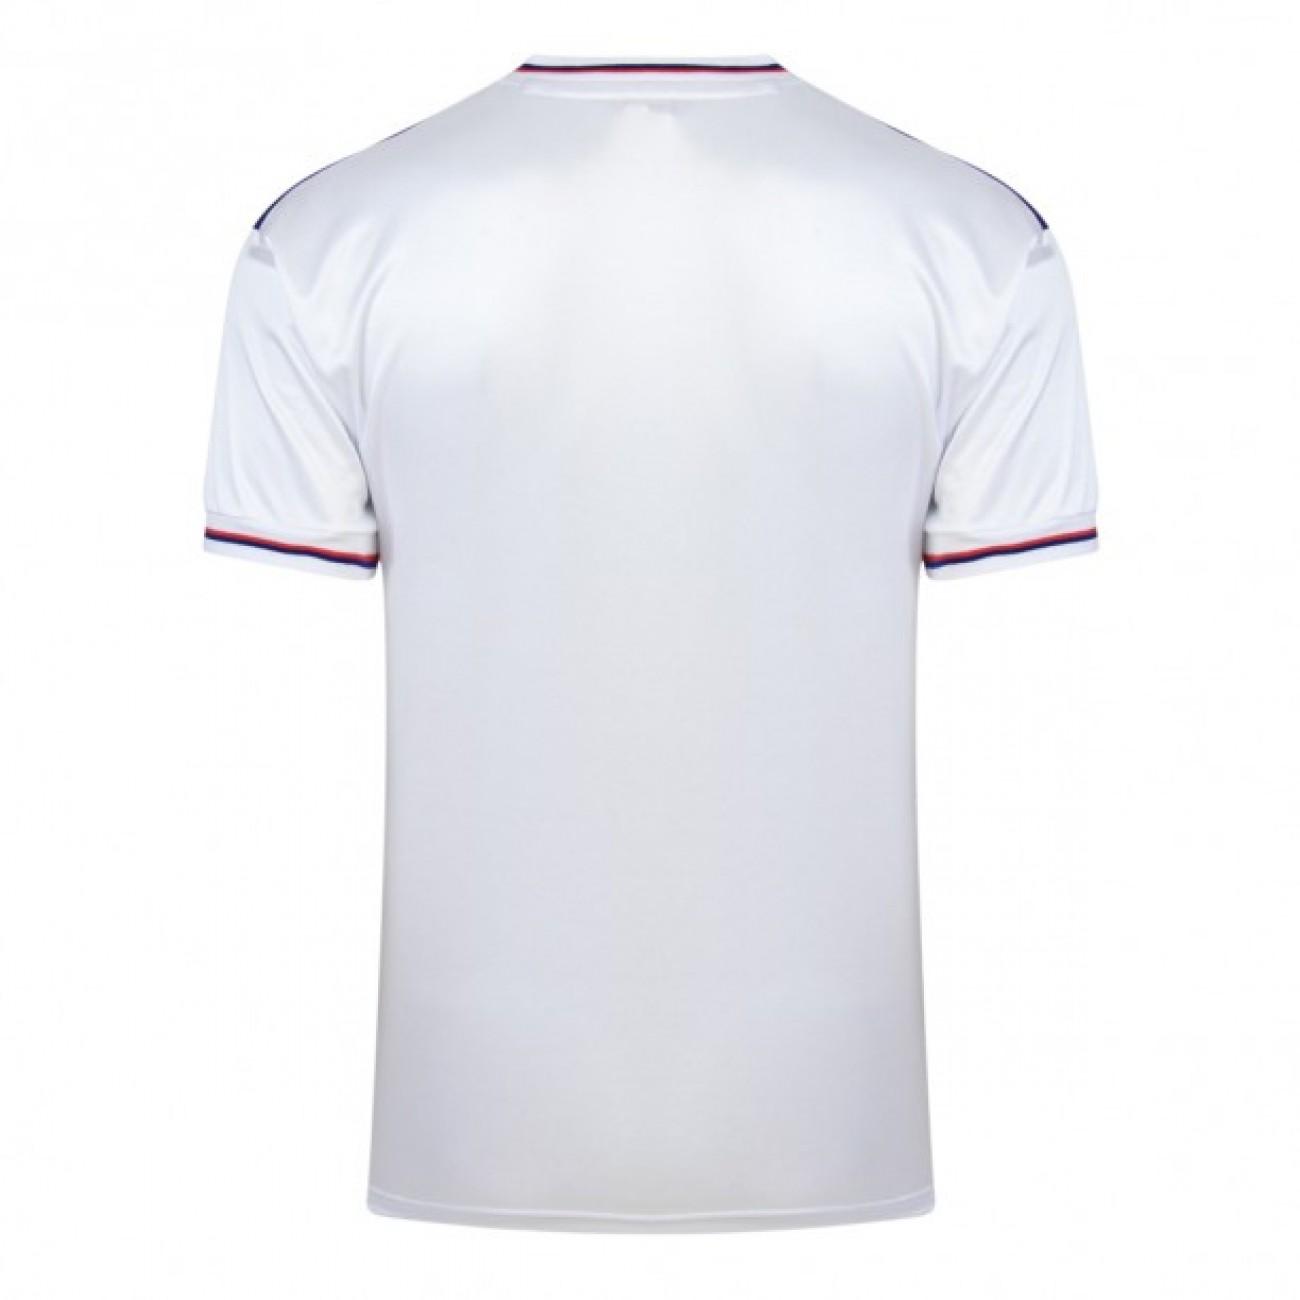 3cab0813102 England, classic shirt, 1982 World cup   Retrofootball®